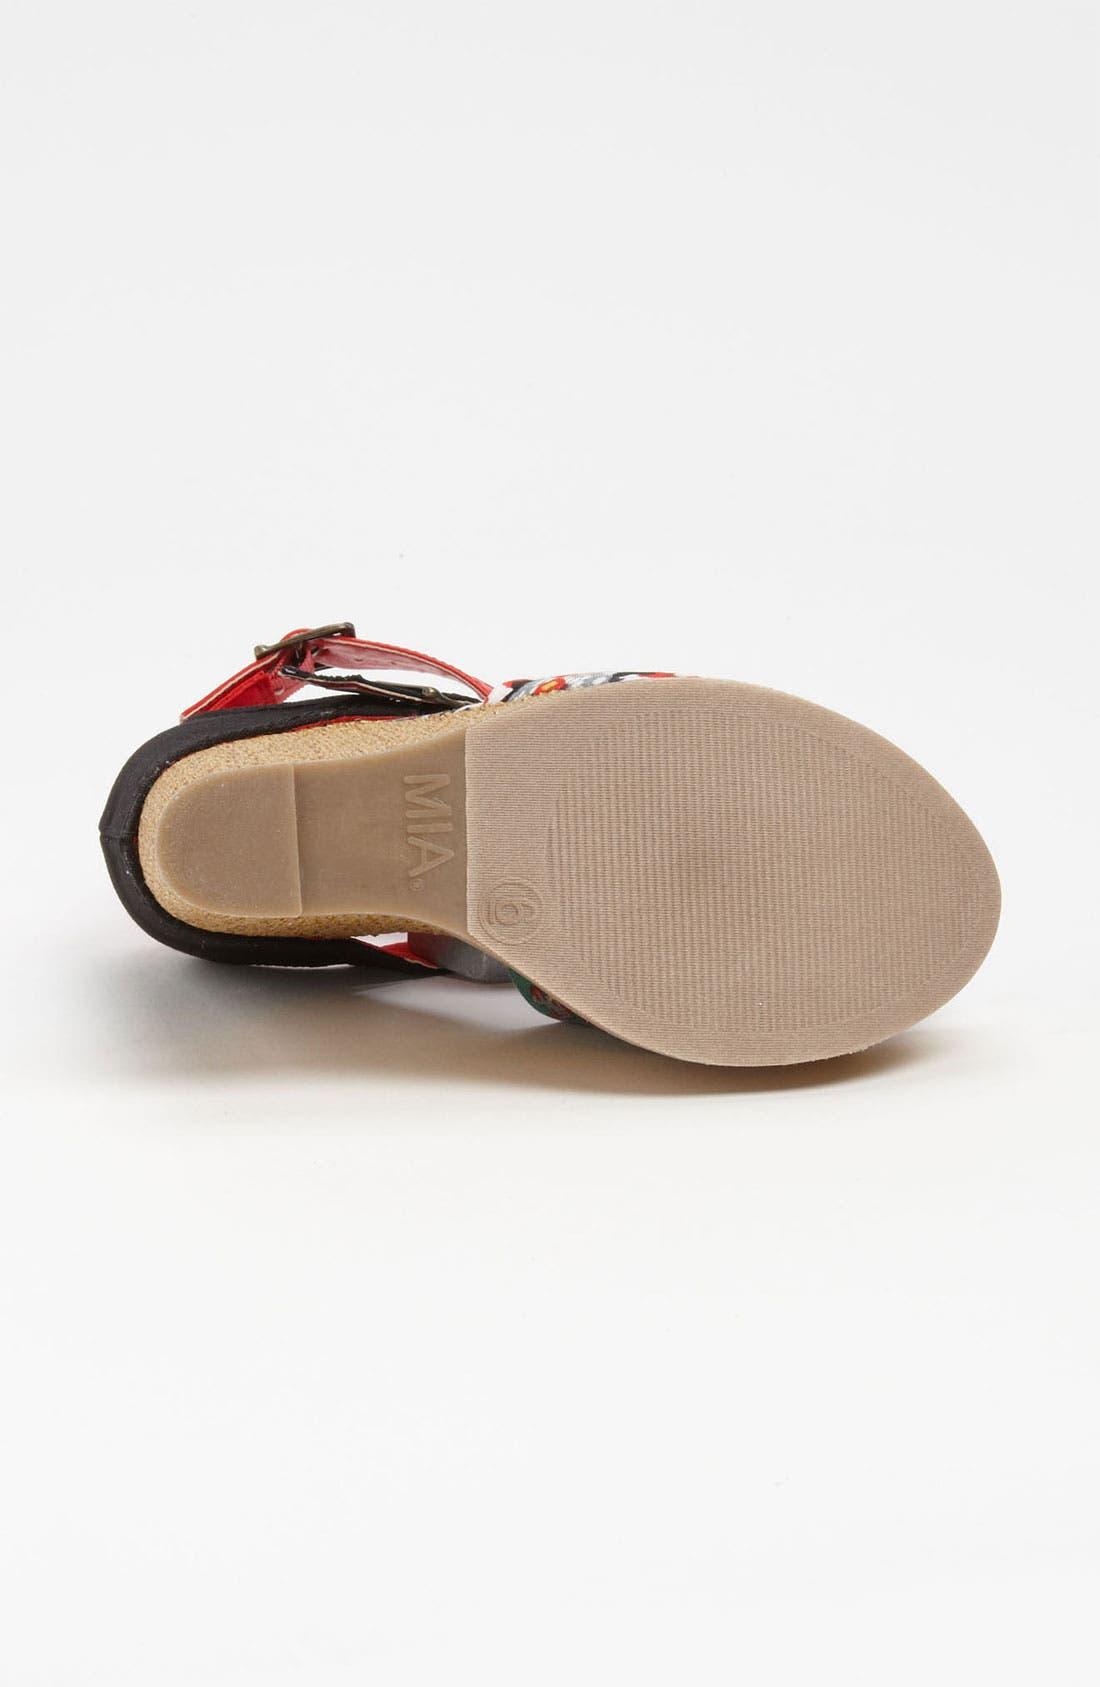 'Ellie' Wedge Sandal,                             Alternate thumbnail 4, color,                             Red